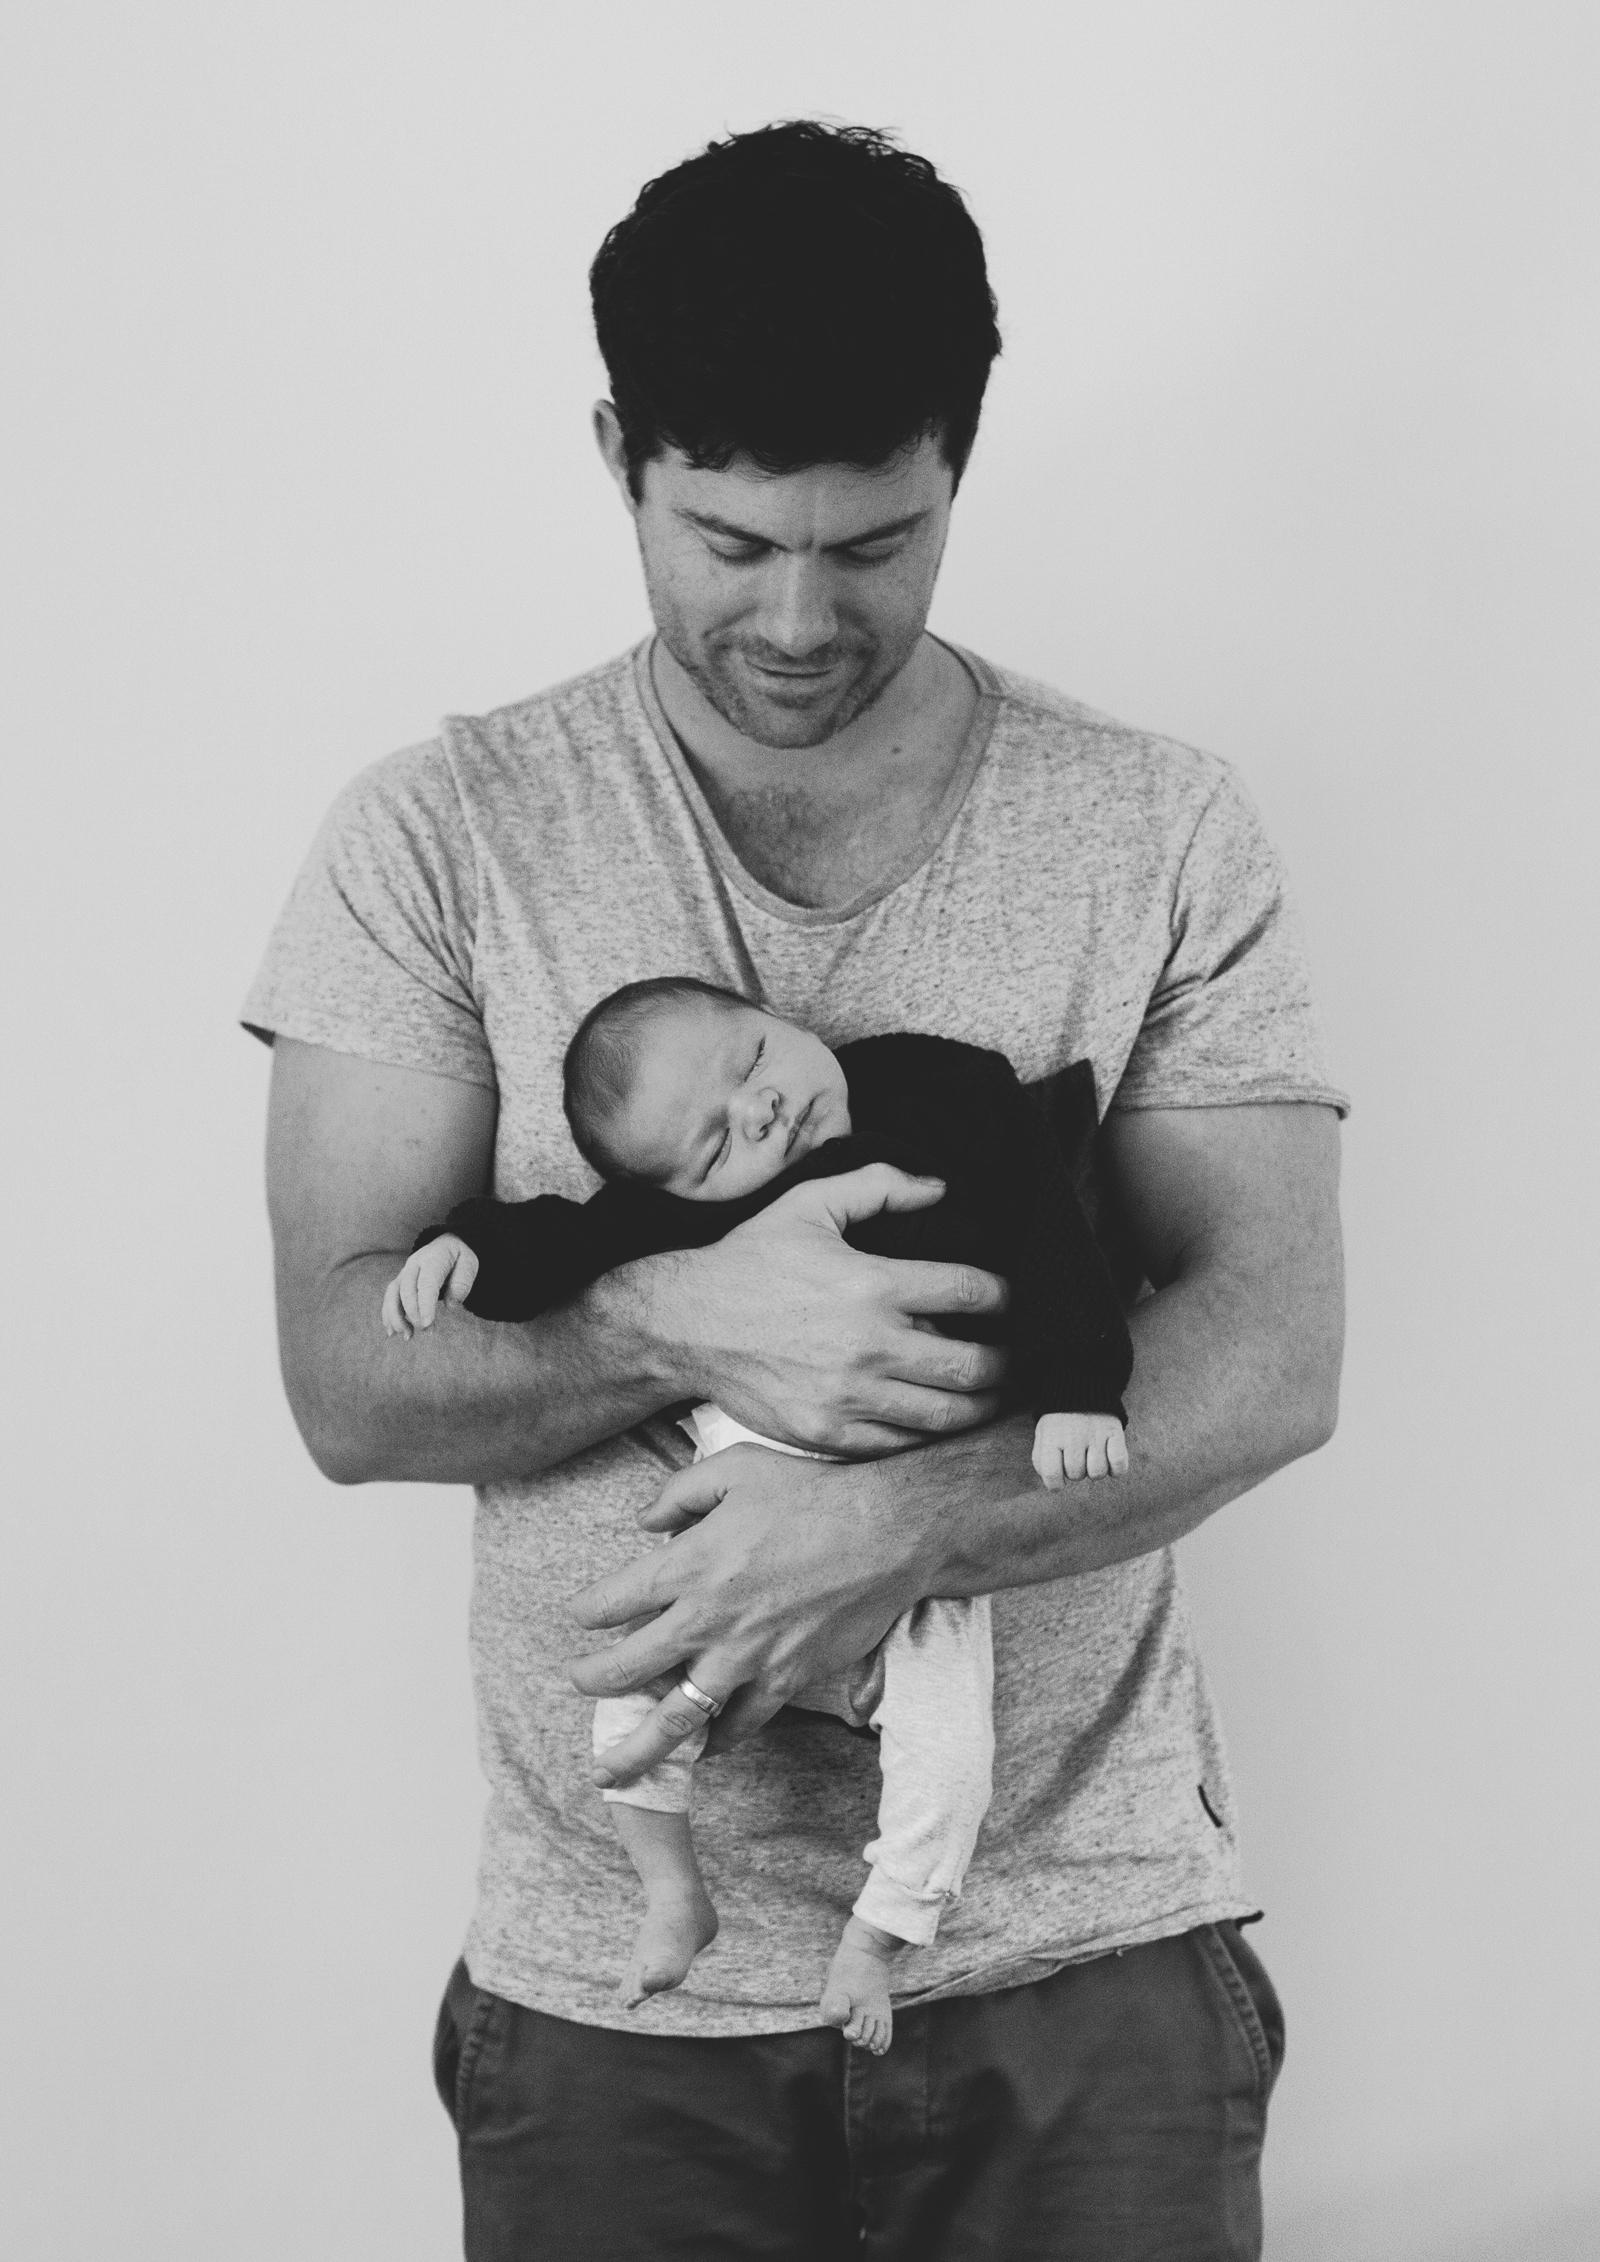 Dad holding newborn baby!